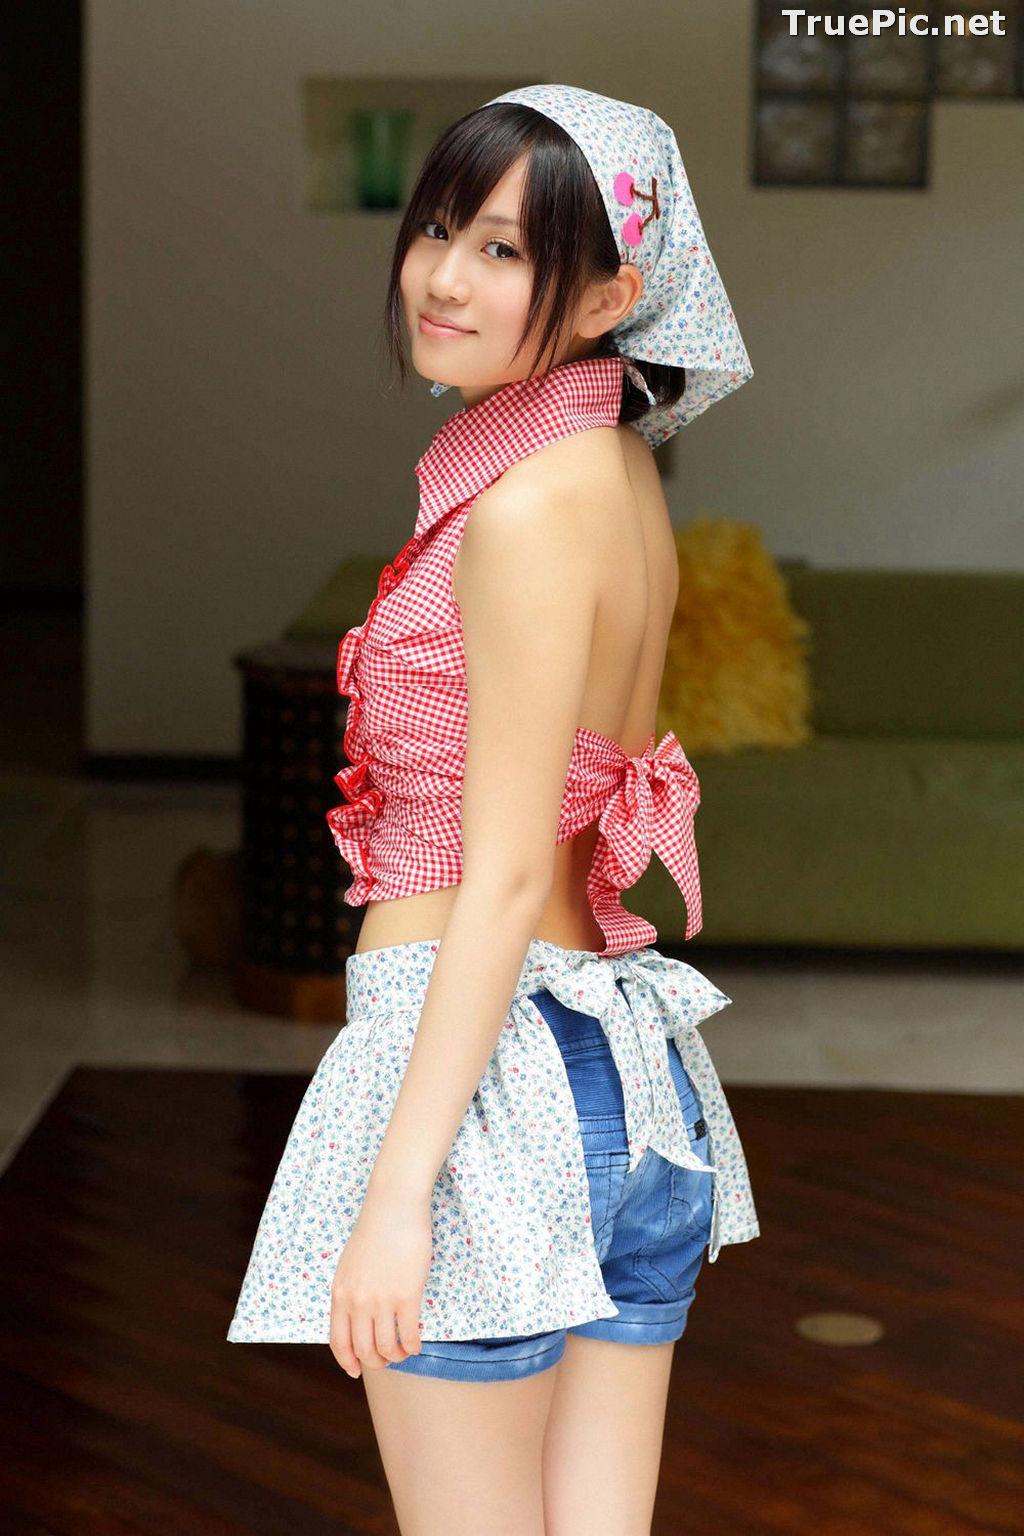 Image [YS Web] Vol.330 - Japanese Actress and Singer - Maeda Atsuko - TruePic.net - Picture-2